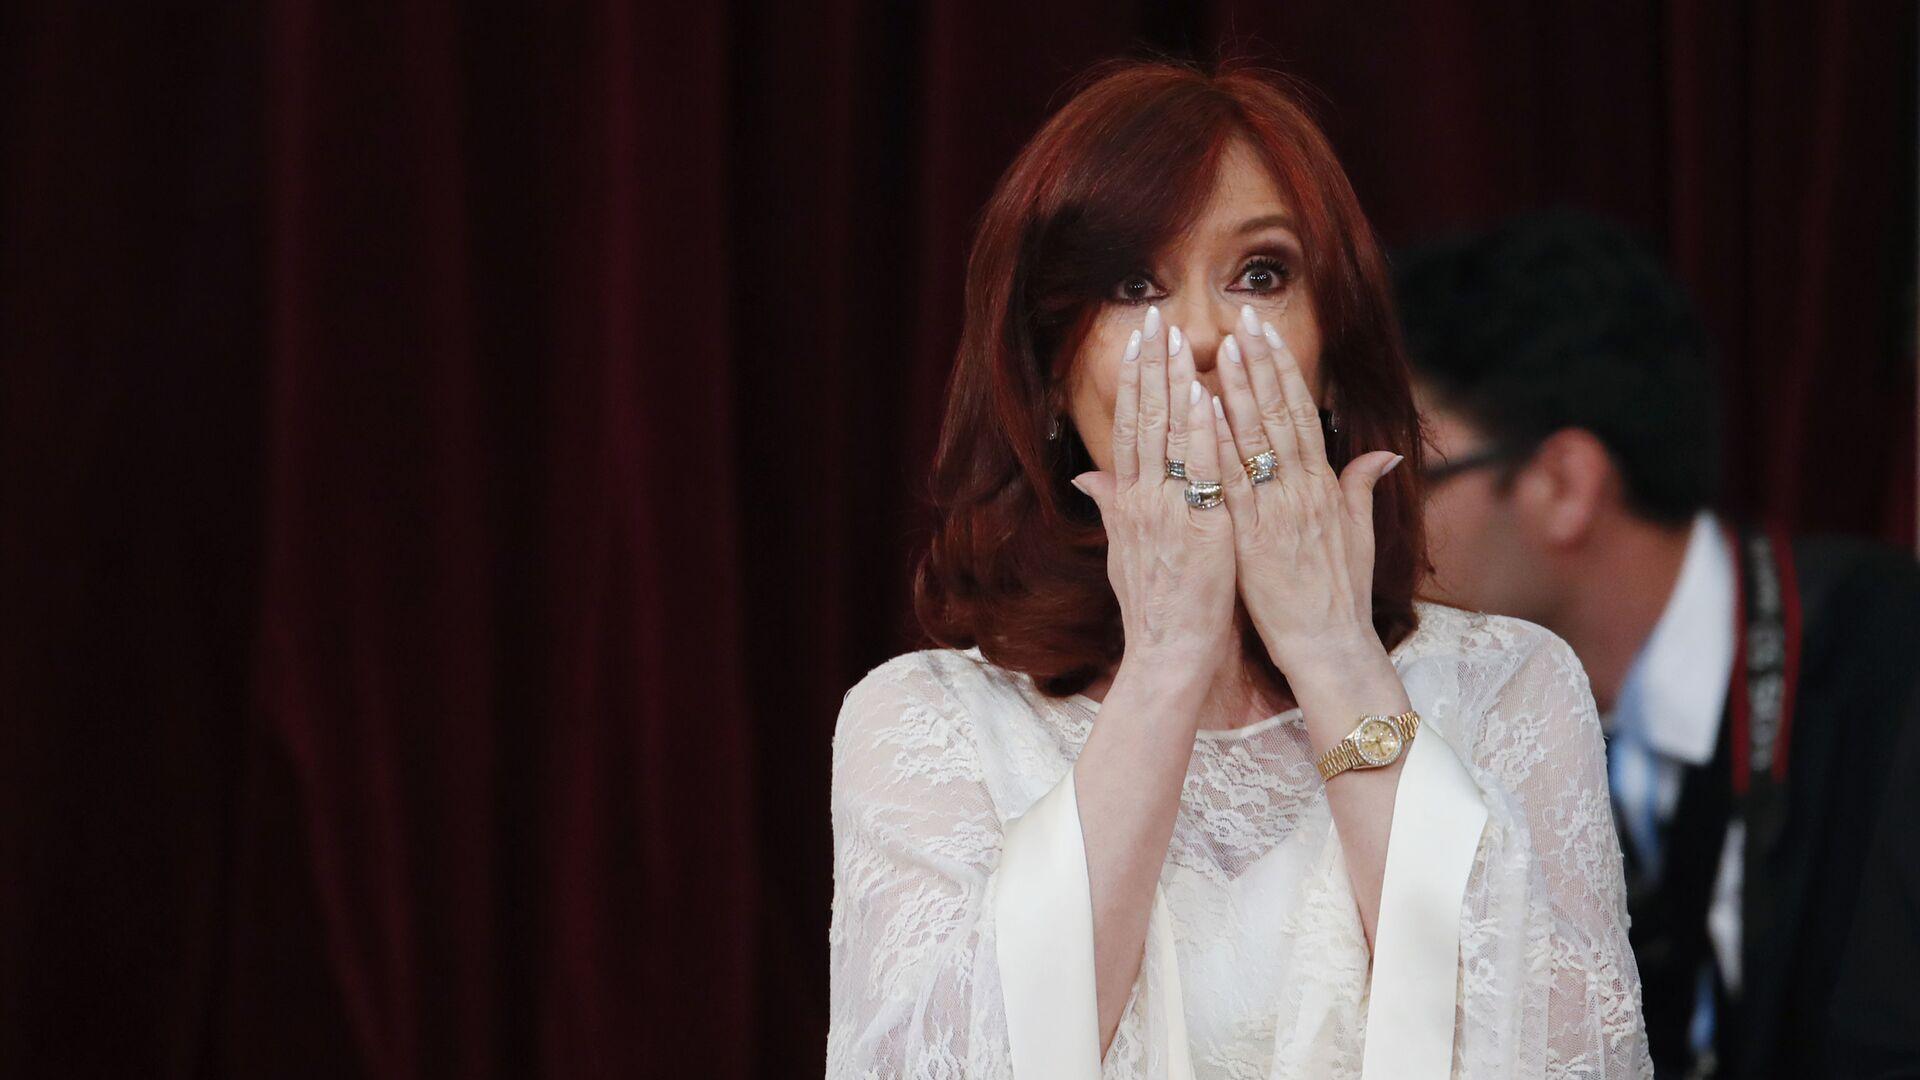 Cristina Fernández de Kirchner - Sputnik Mundo, 1920, 19.03.2021